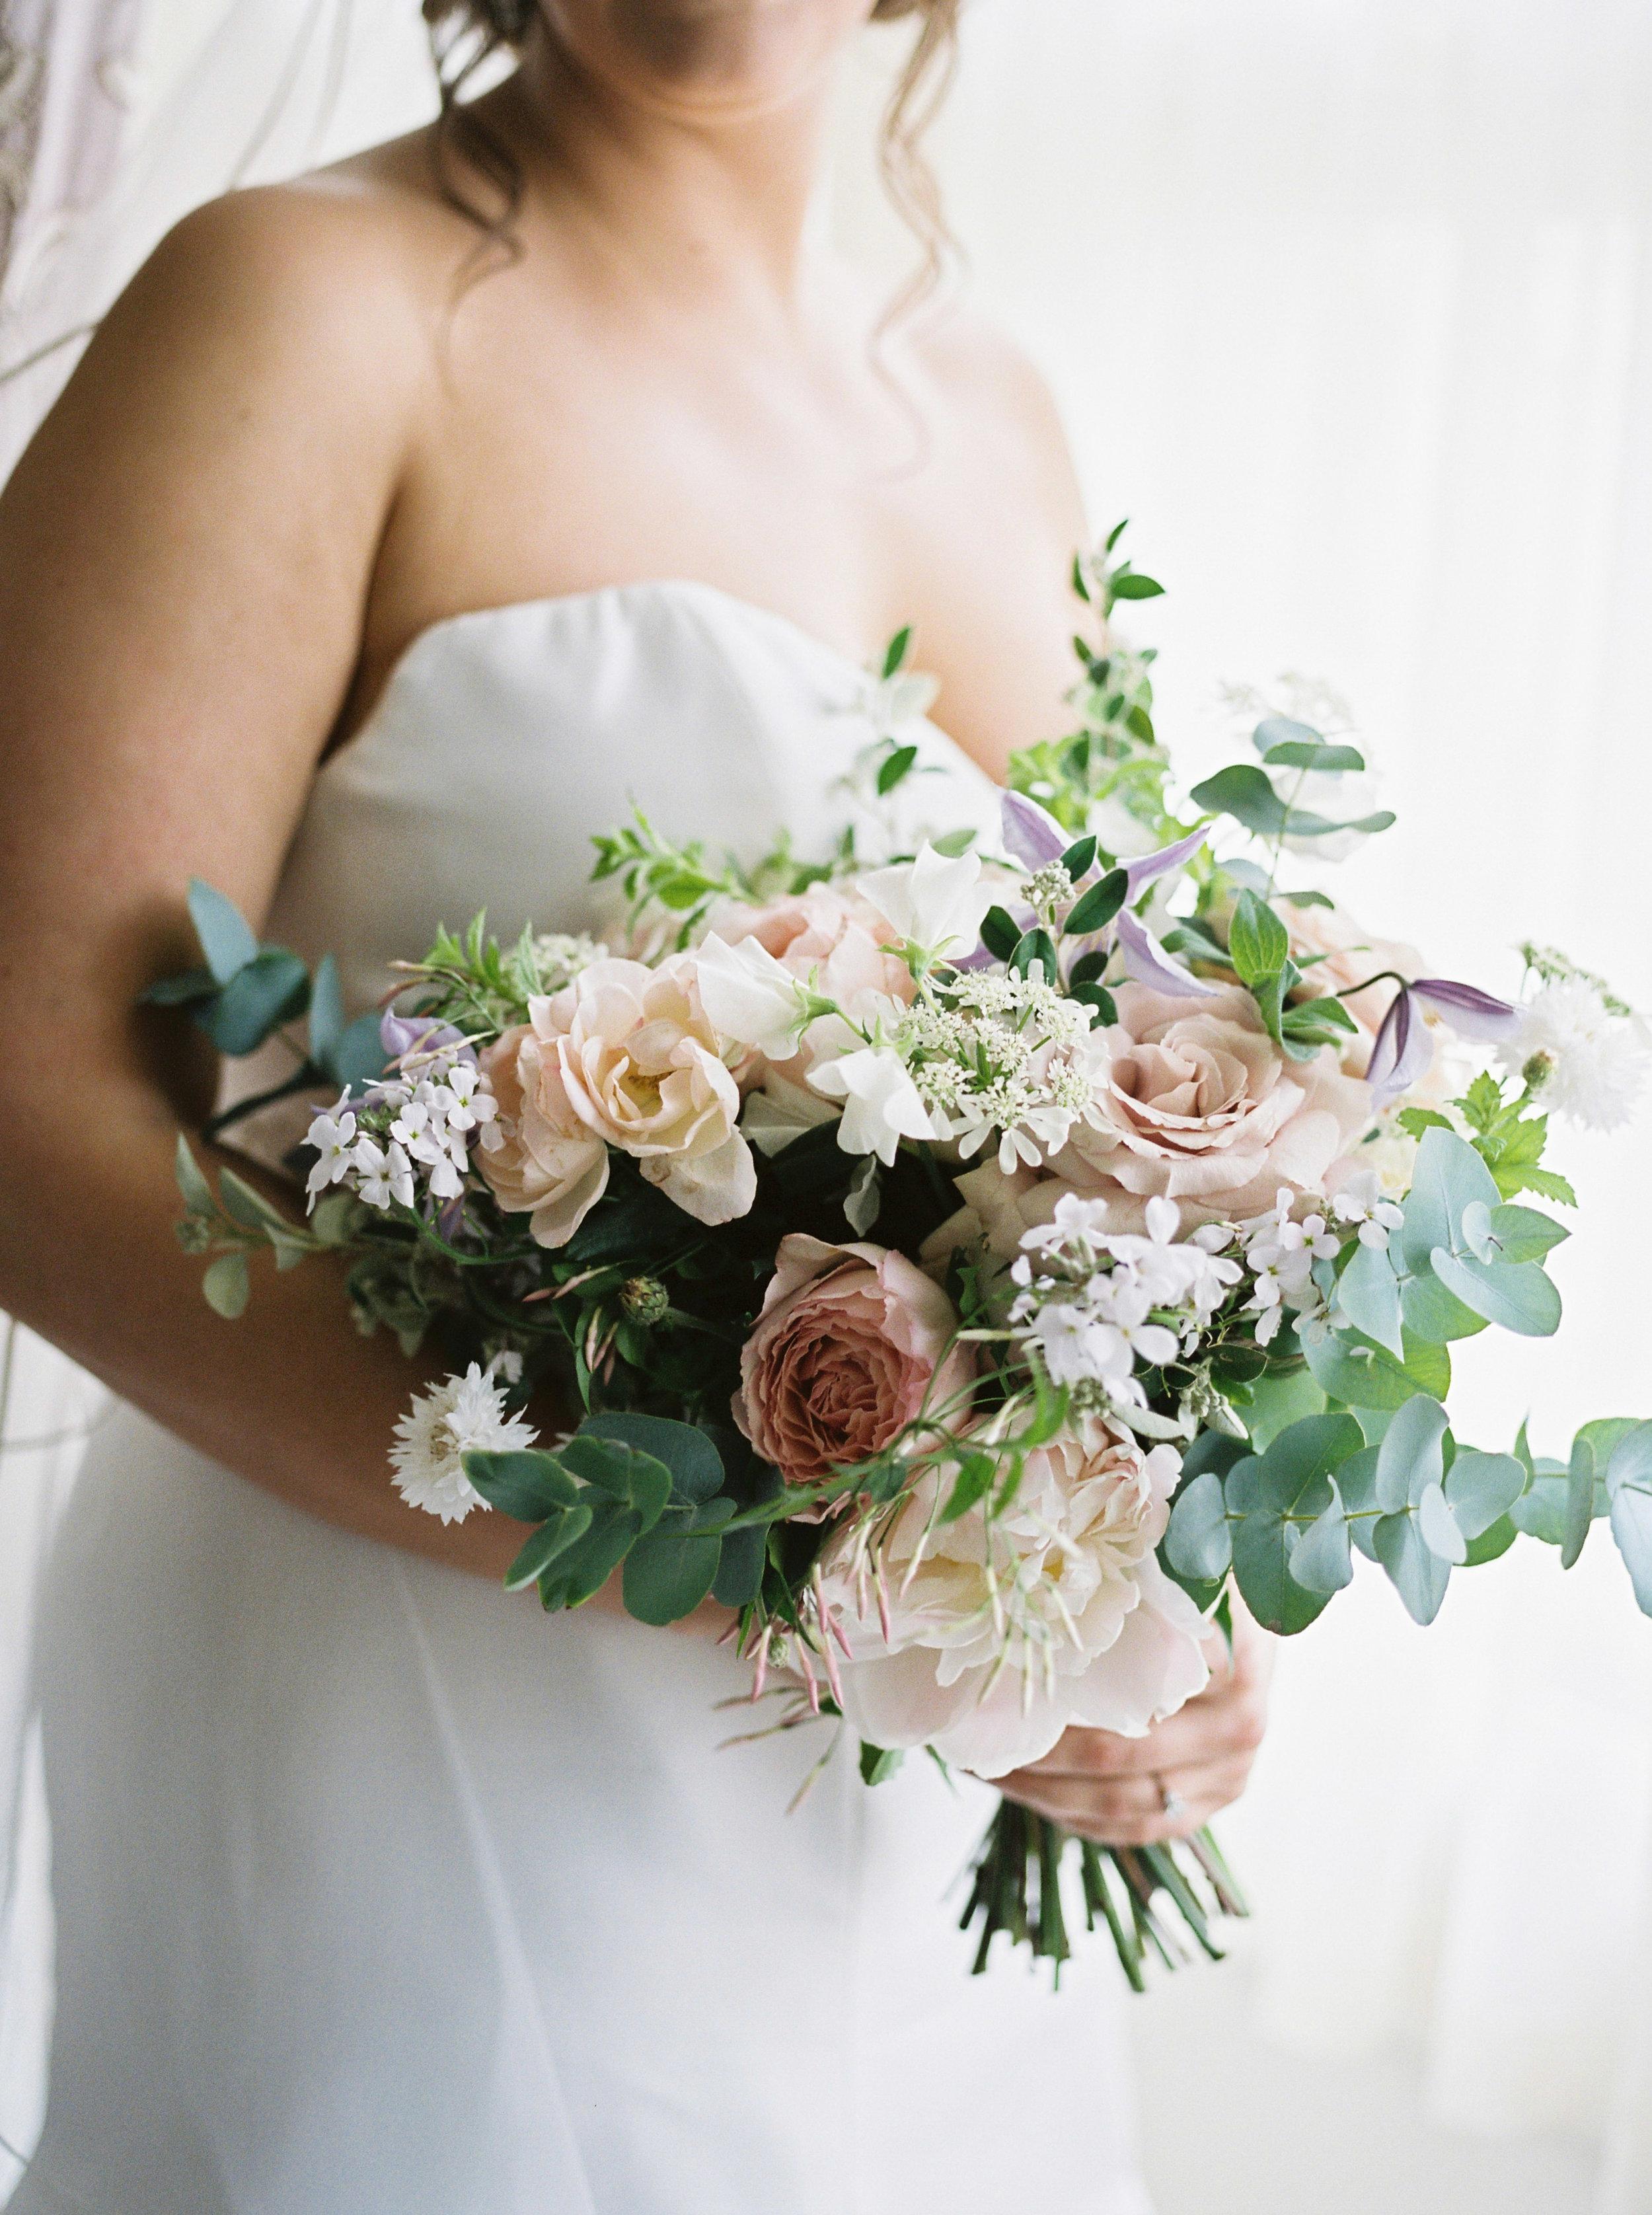 Vanilla Rose Weddings | Blenheim Palace Wedding Planner